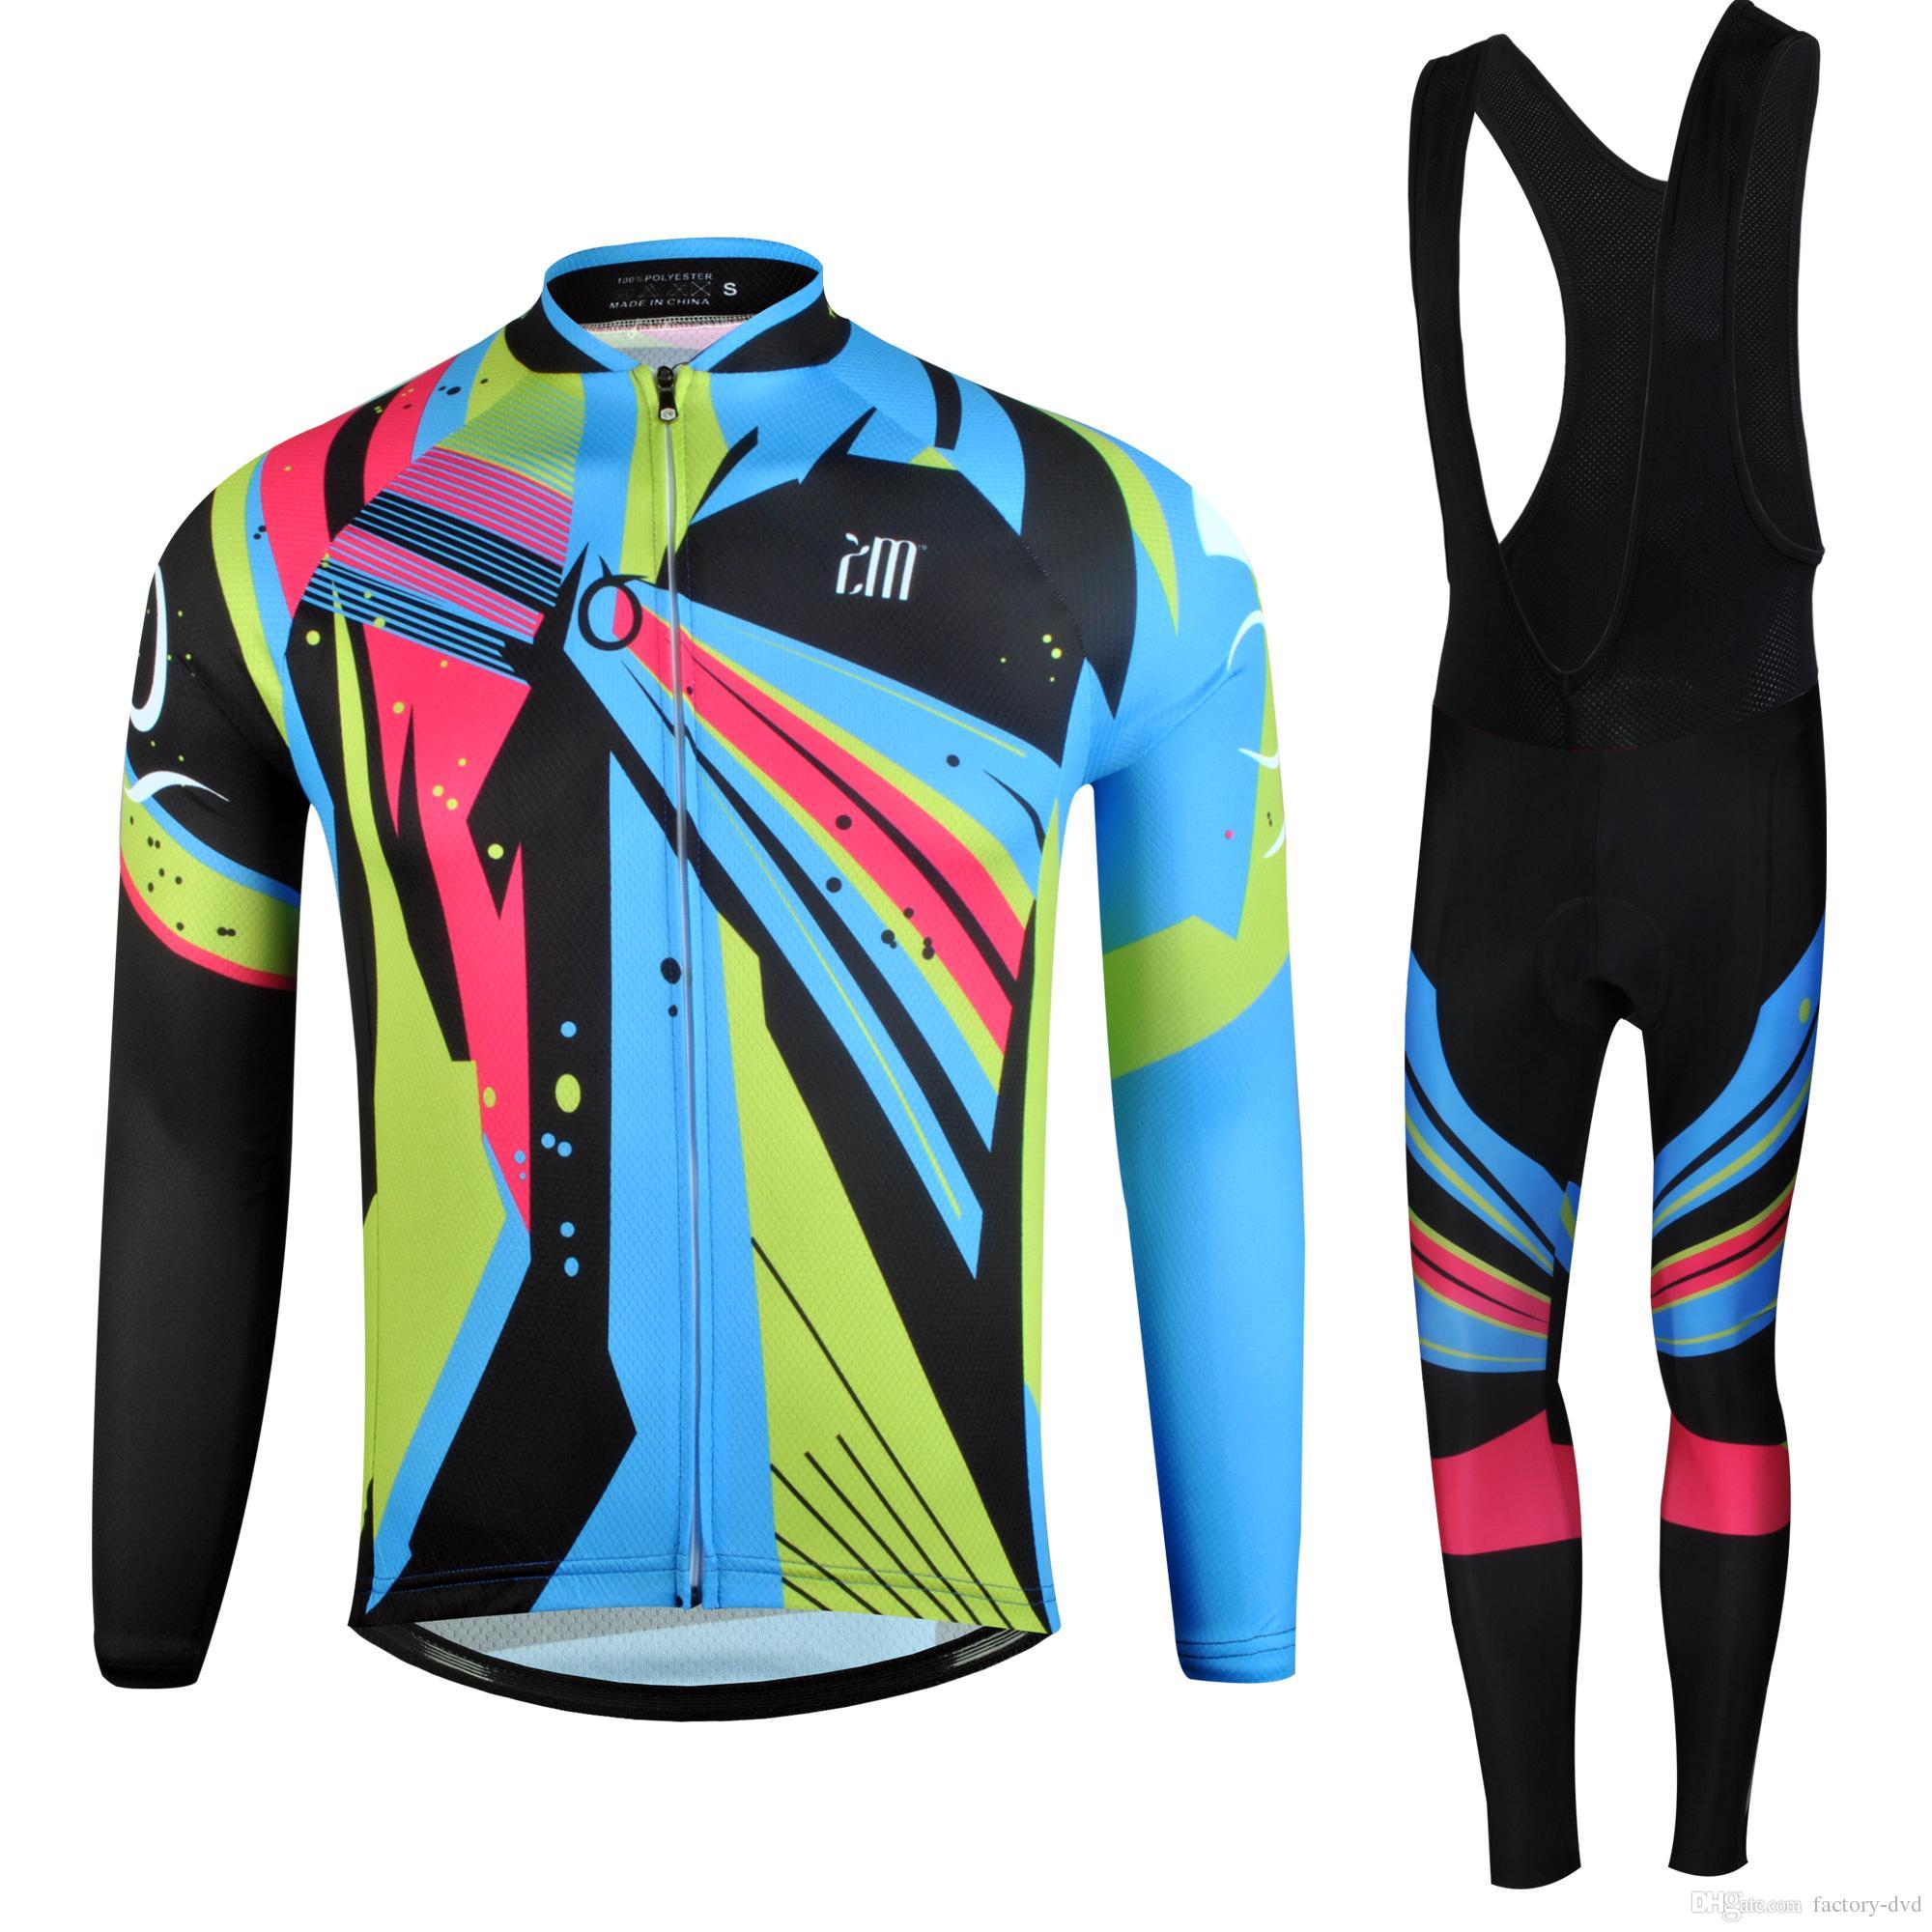 New Cycling Jersey Long Sleeve Racing Bike Cube Cycling Clothing MTB ... 425a3daea